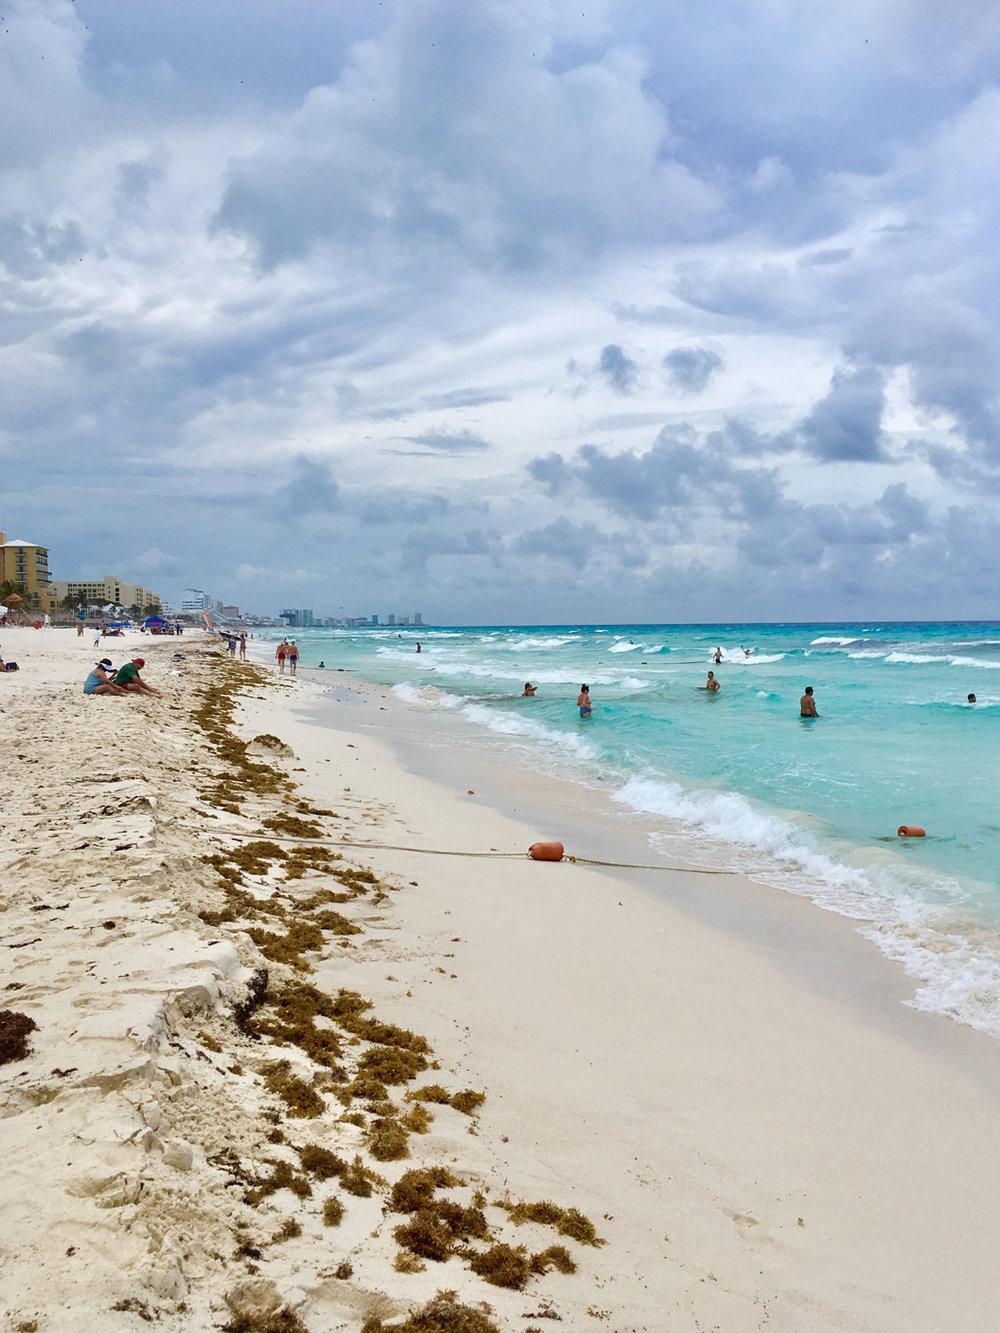 Hammocks_and_Ruins_Riviera_Maya_Mexico_Explore_What_to_Do_Yucatan_Cancun_Beaches_Playa_Ballenas_8.jpg